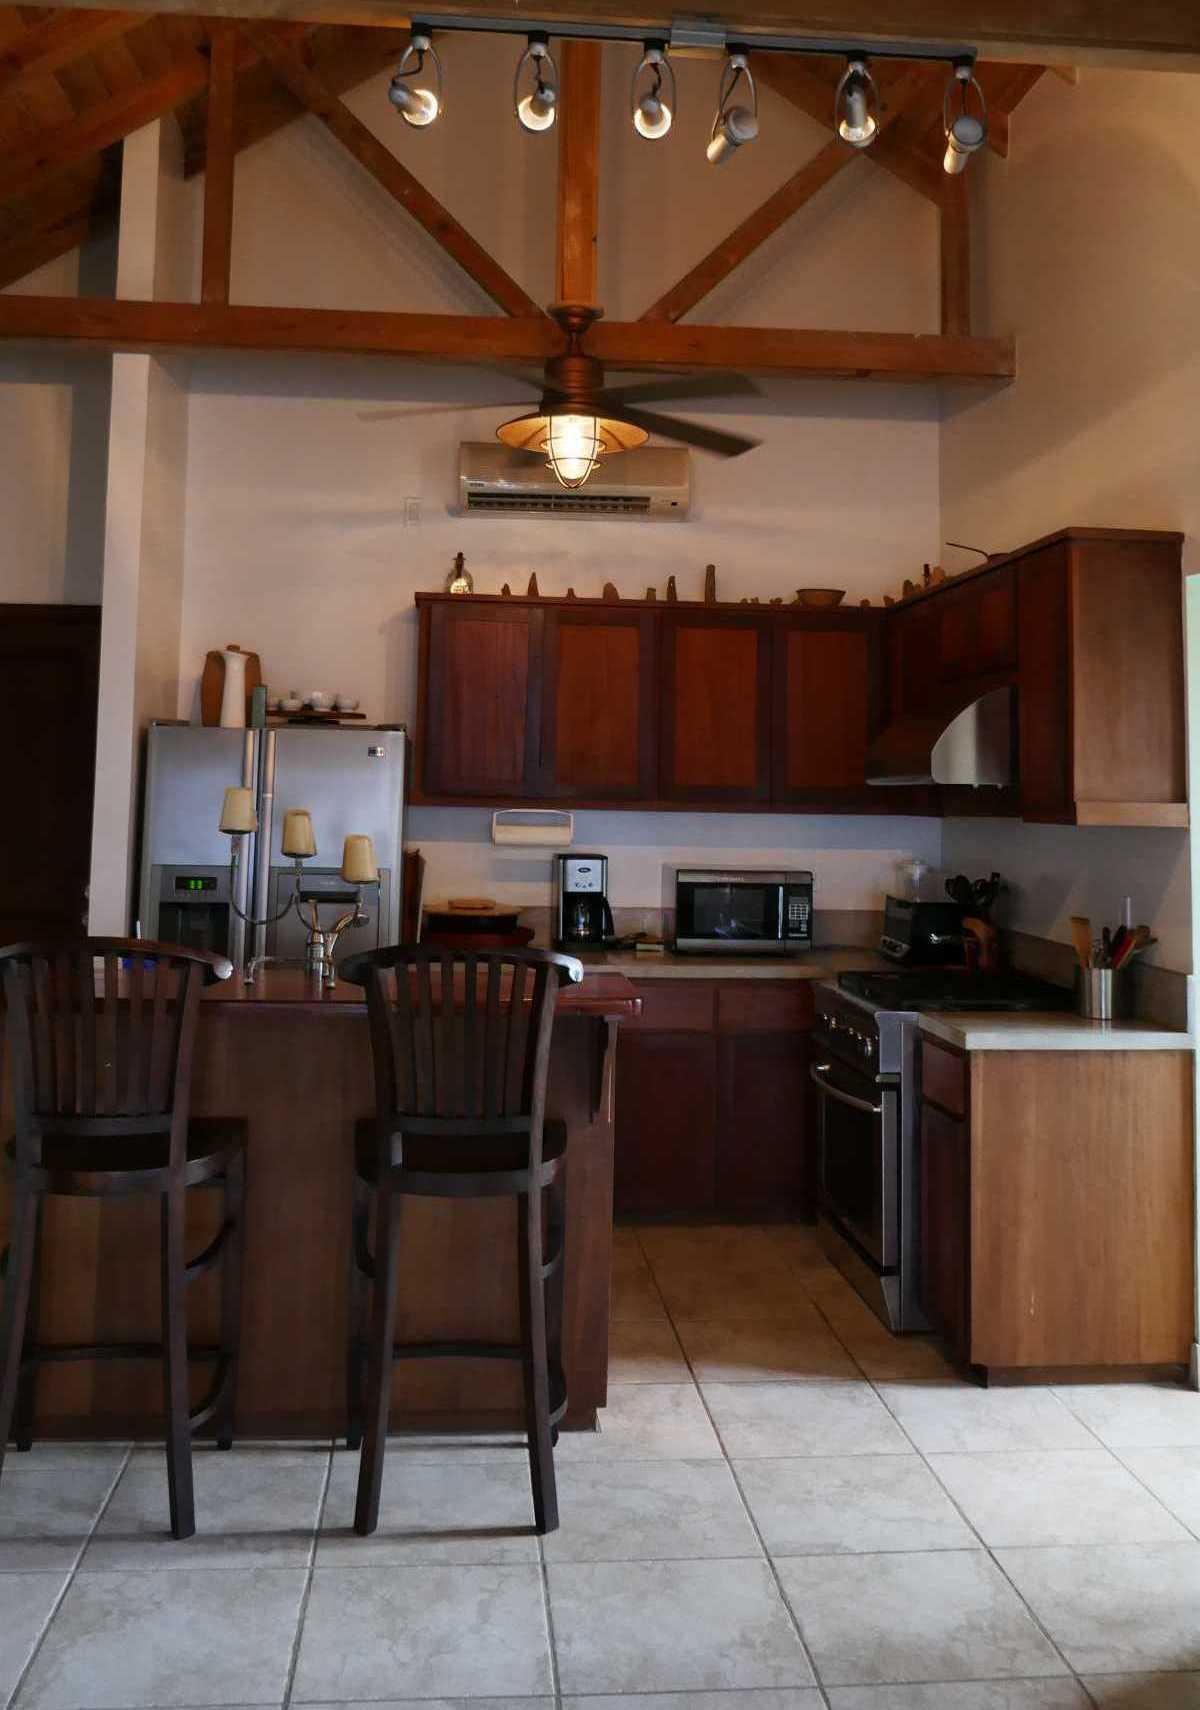 Vacation Rentals in Roatan Honduras   Casa Del Solomon Roatan, Honduras  12